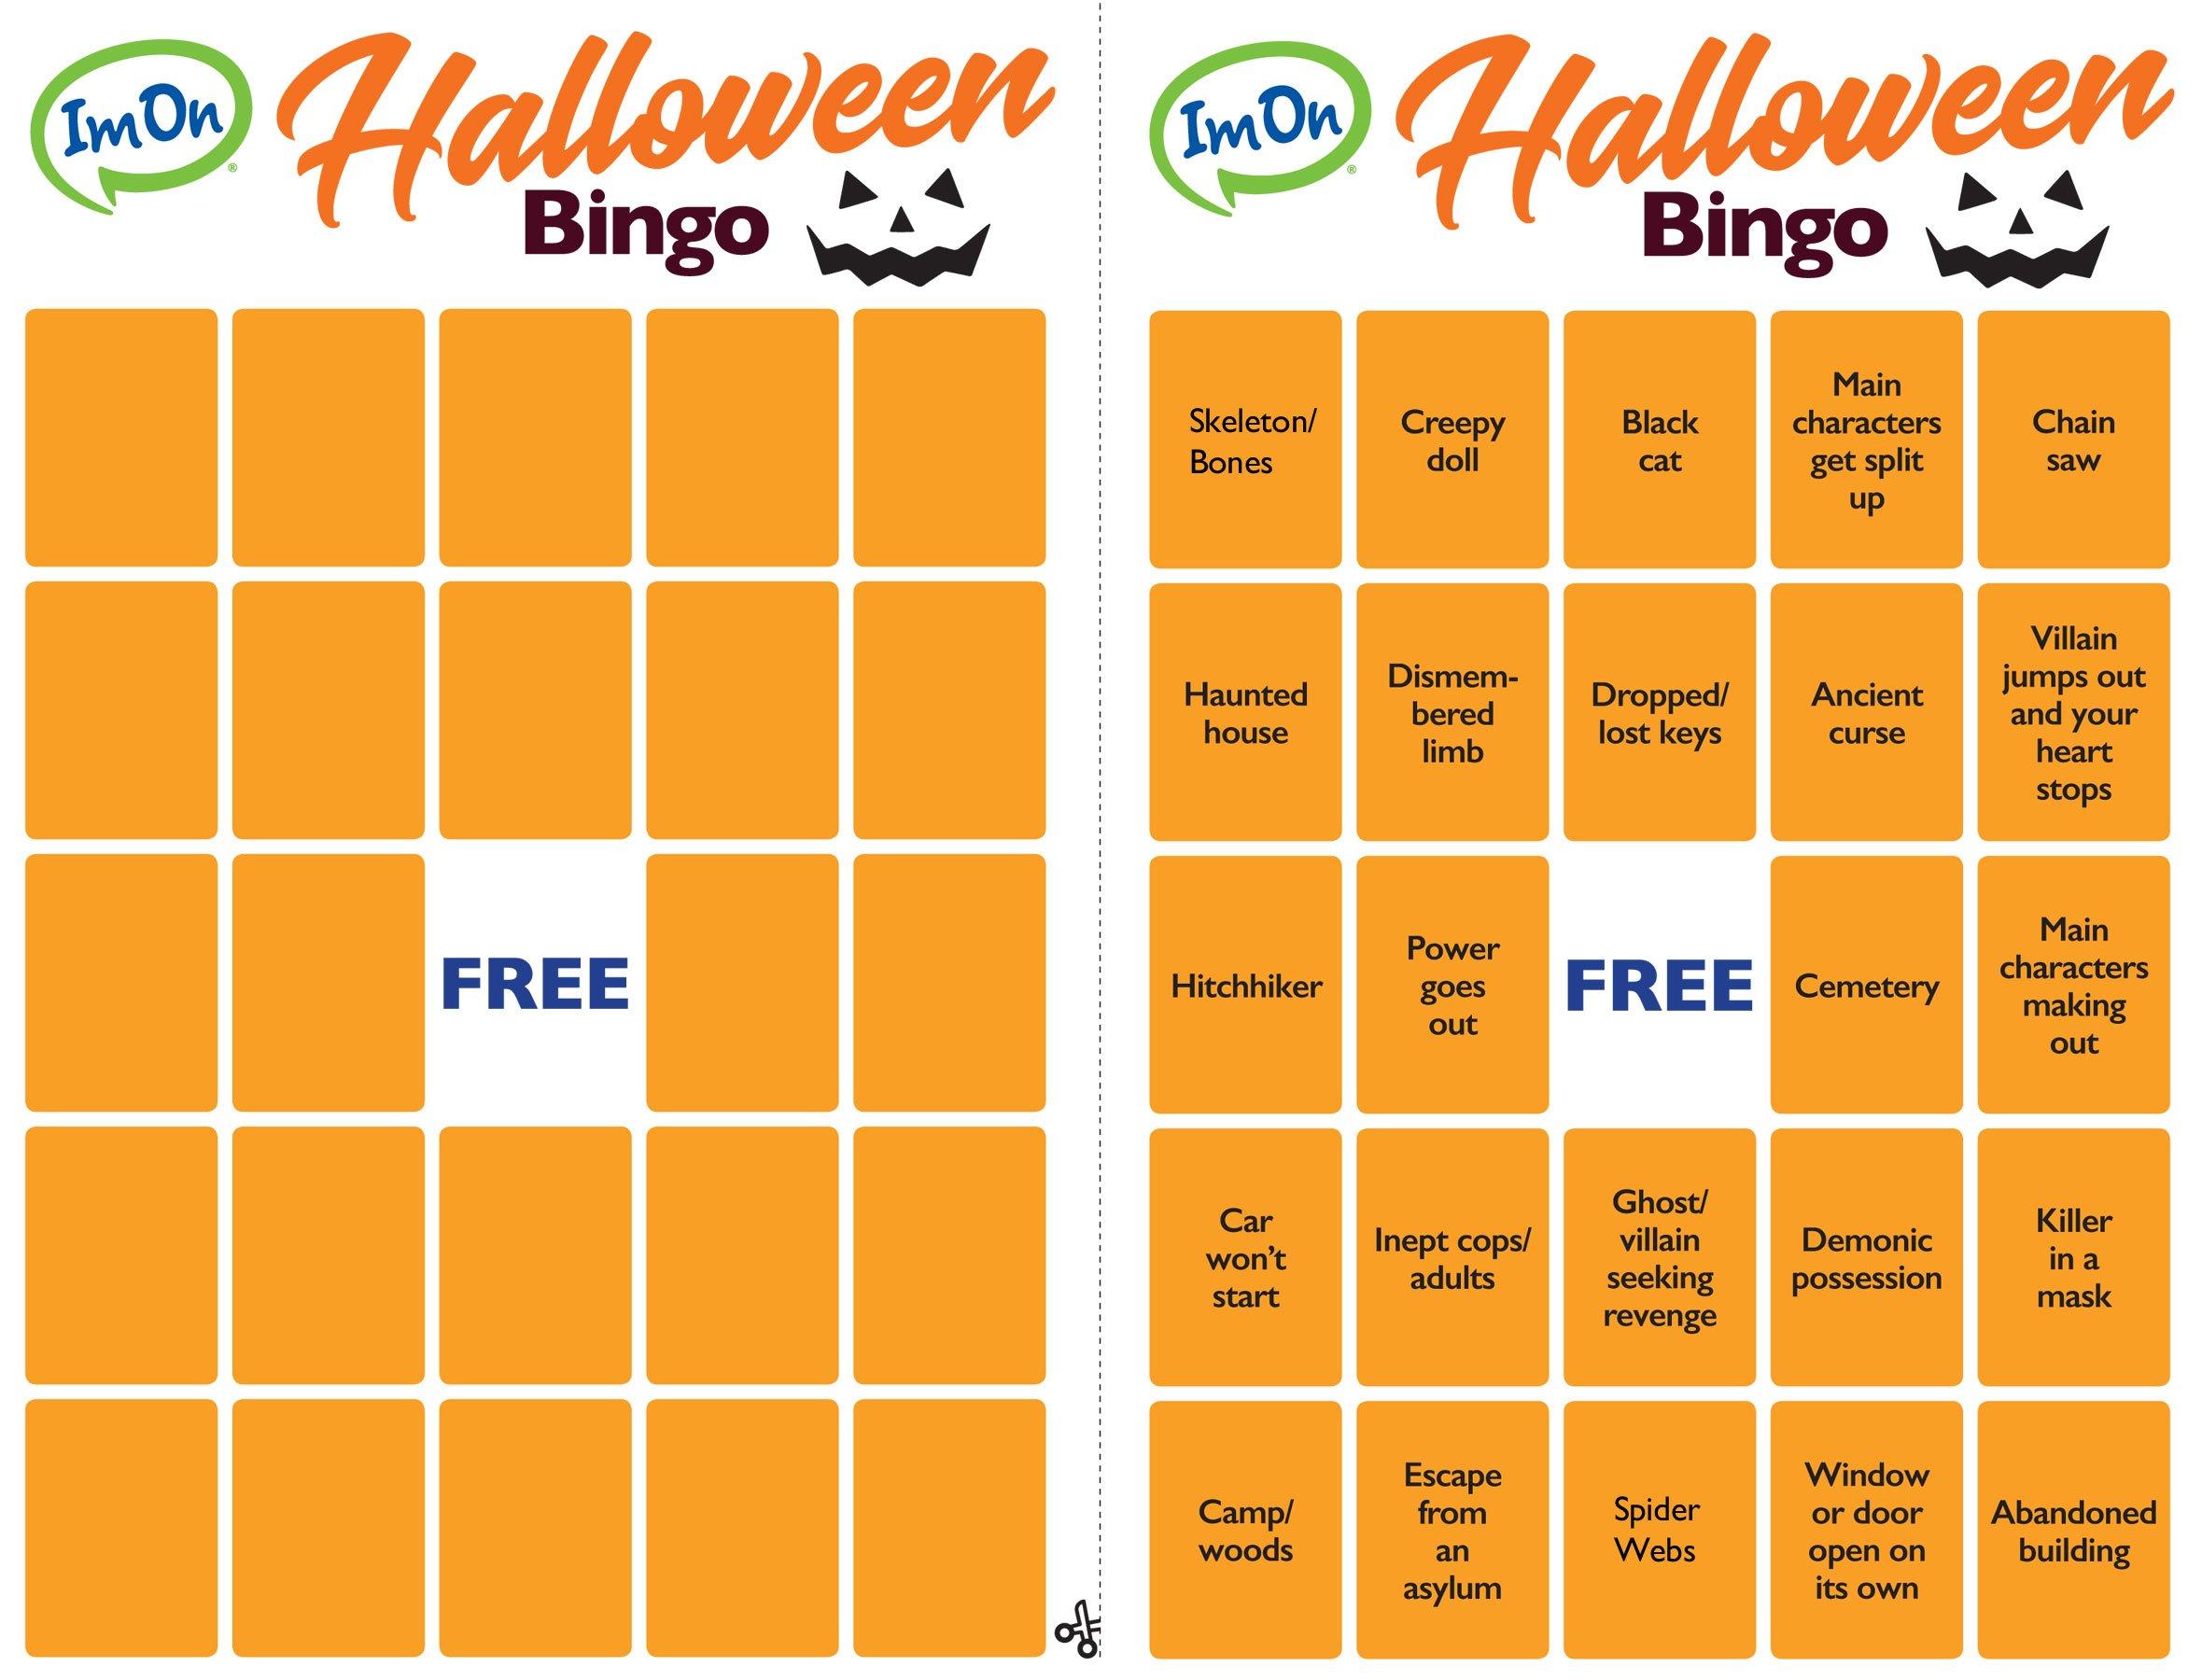 Halloween-Bingo-Cards-1-1